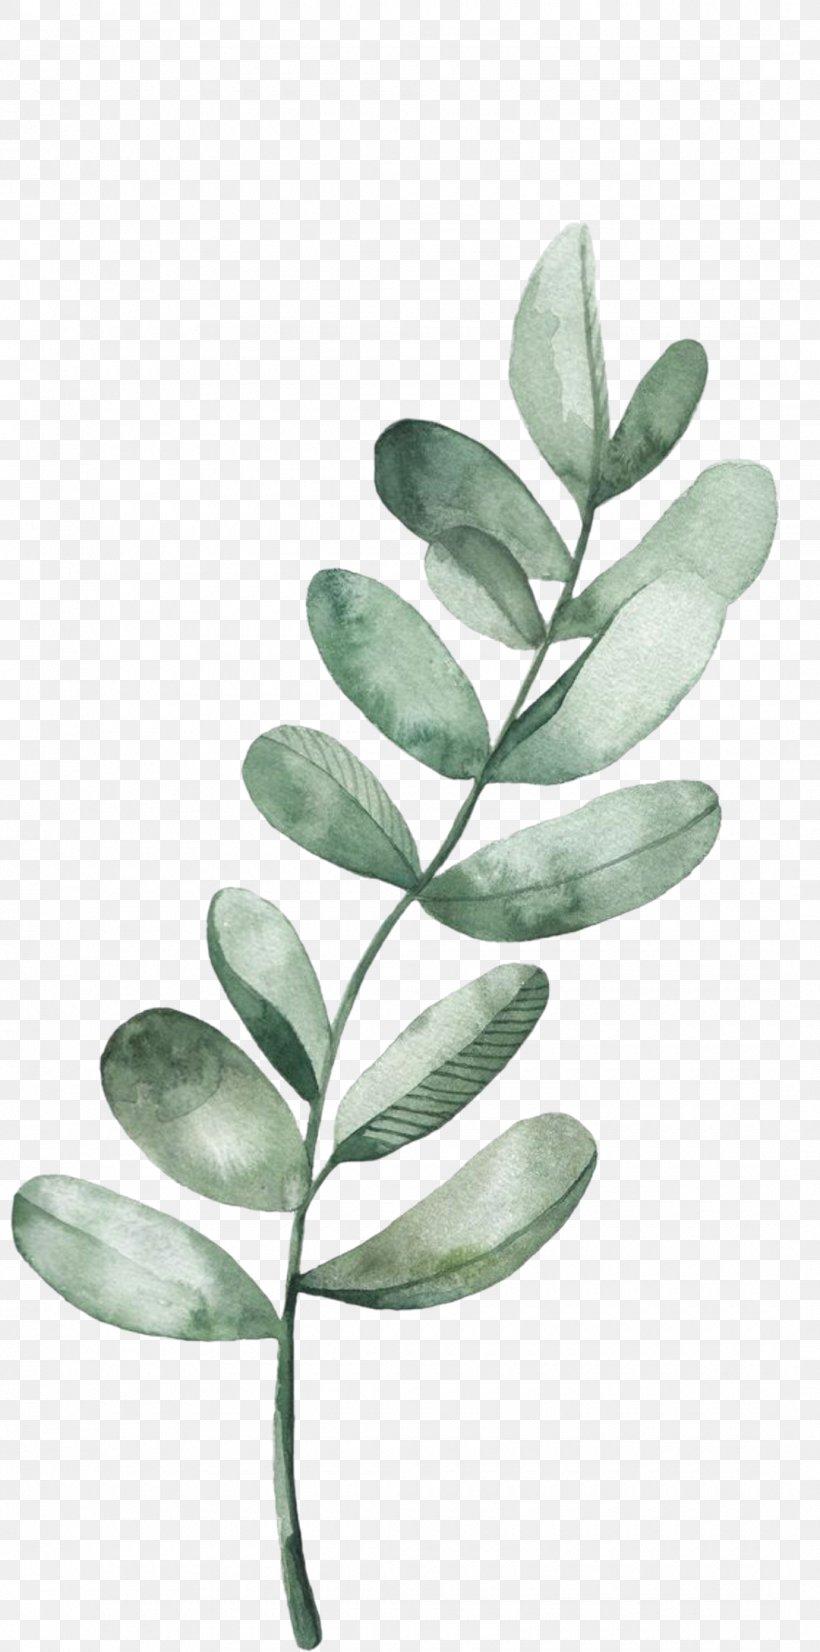 Leaf Plant Flower Tree Branch, PNG, 1080x2177px, Leaf, Blackandwhite, Branch, Flower, Plant Download Free